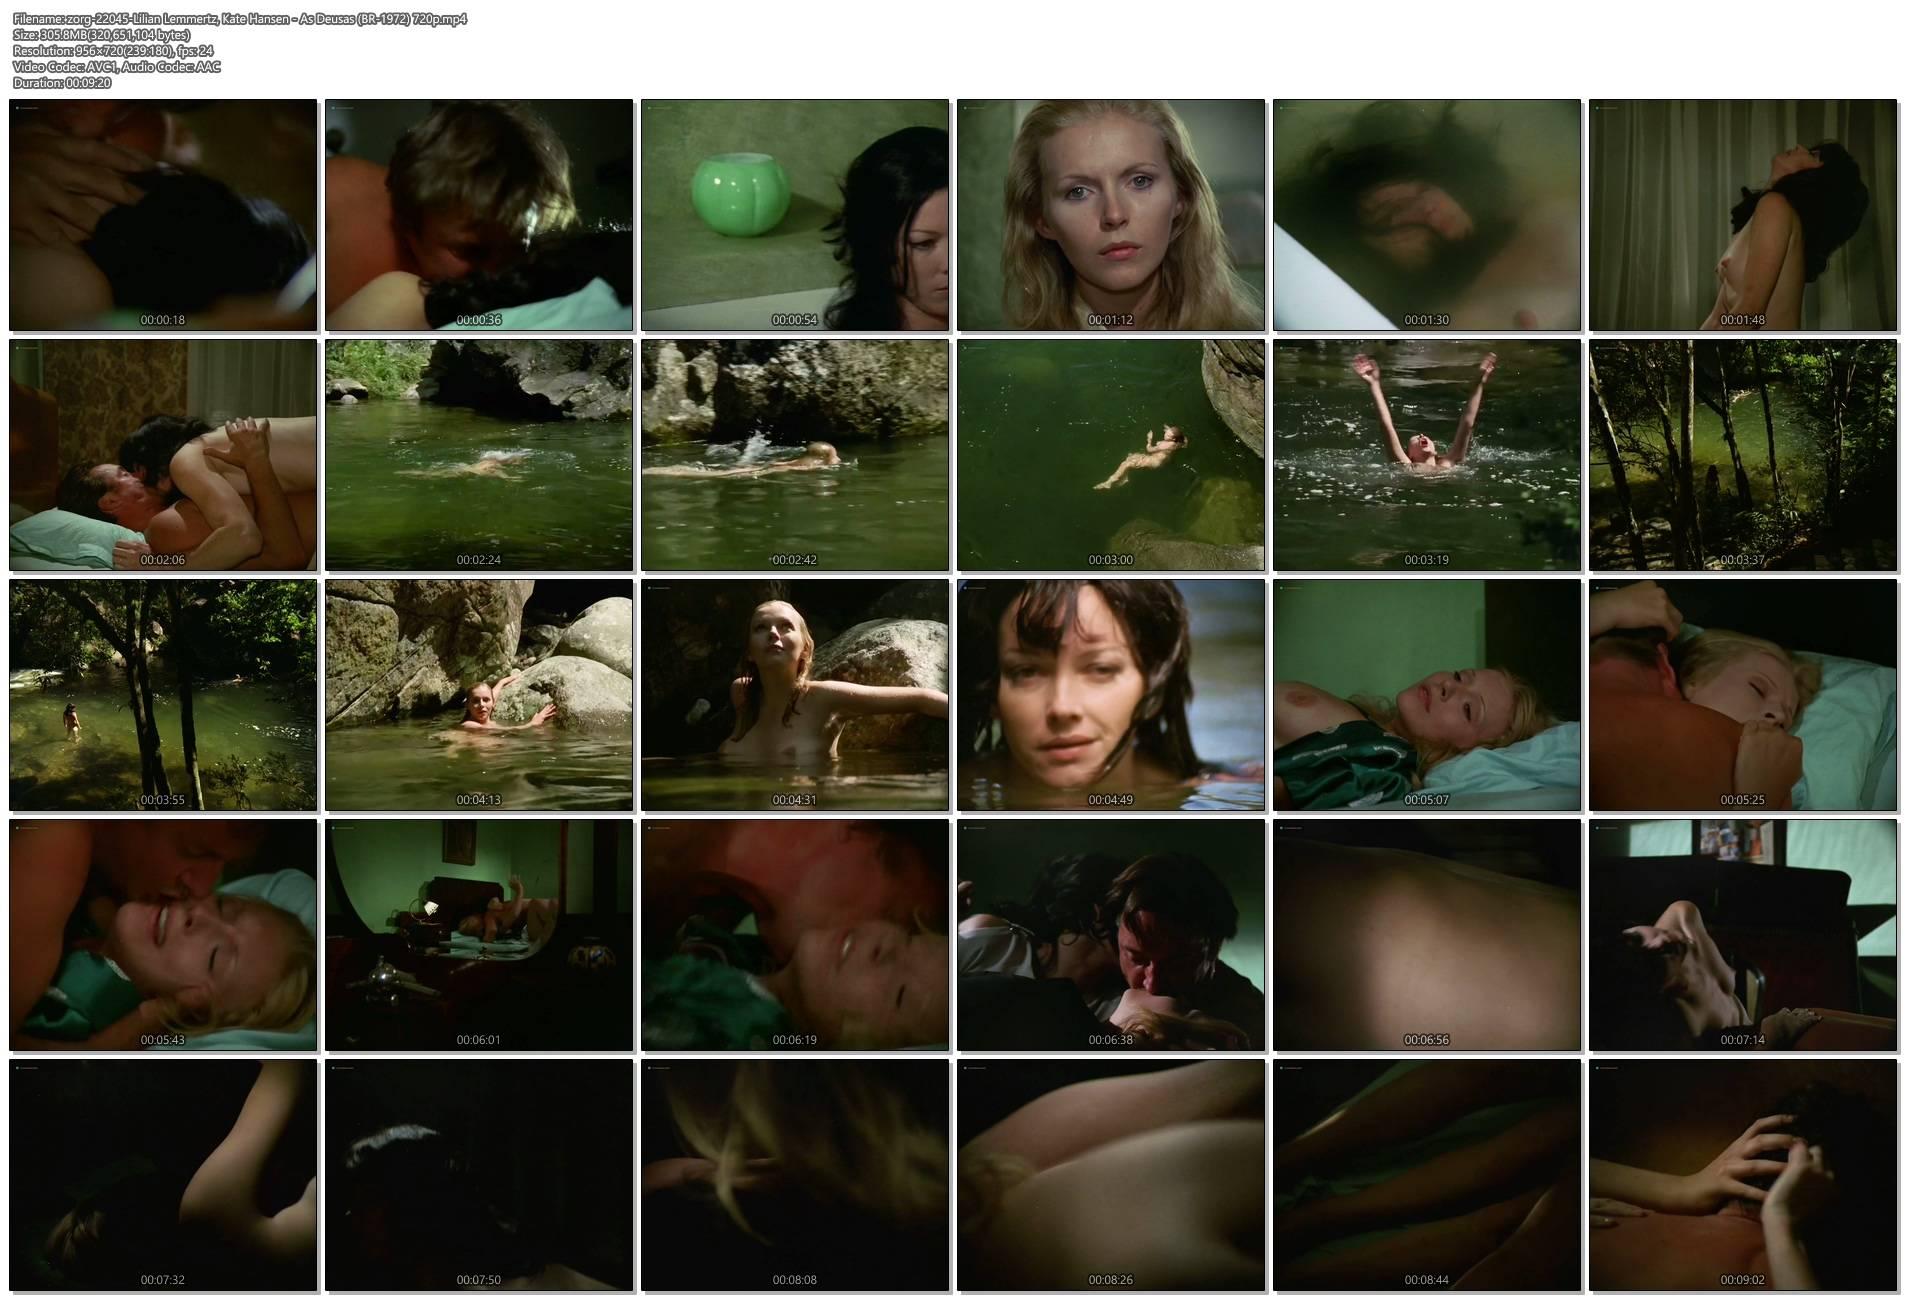 Lilian Lemmertz nude sex and Kate Hansen nude sex threesome - As Deusas (BR-1972) 720p (1)